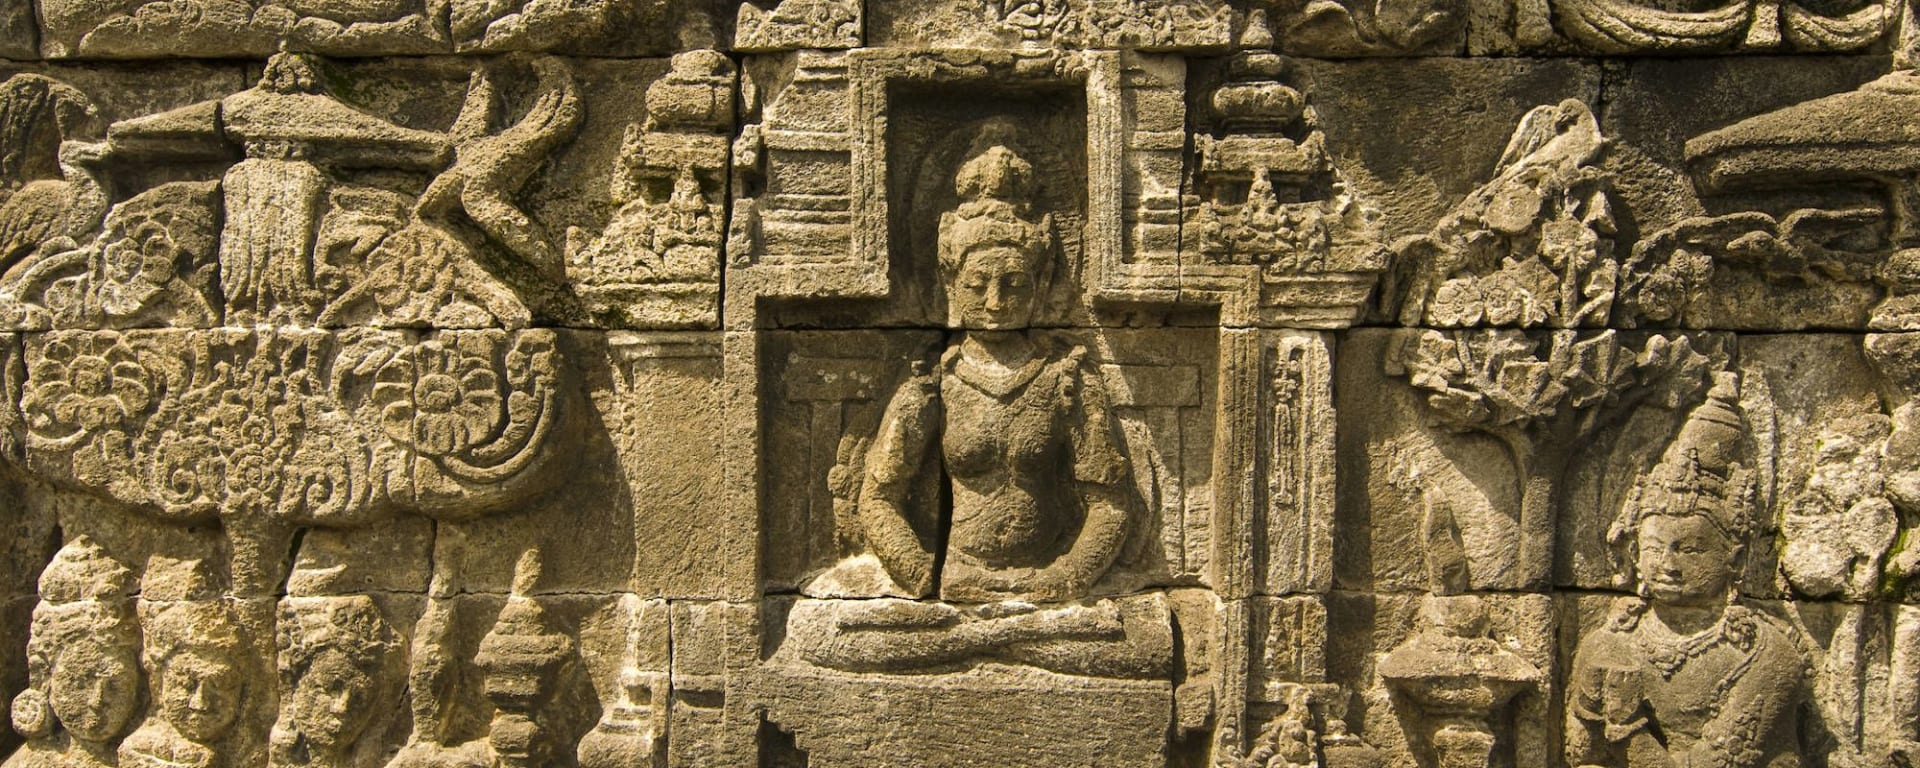 Tour de ville & Temple de Borobudur à Yogyakarta: Yogyakarta Borobudur Story of Buddha in a wall